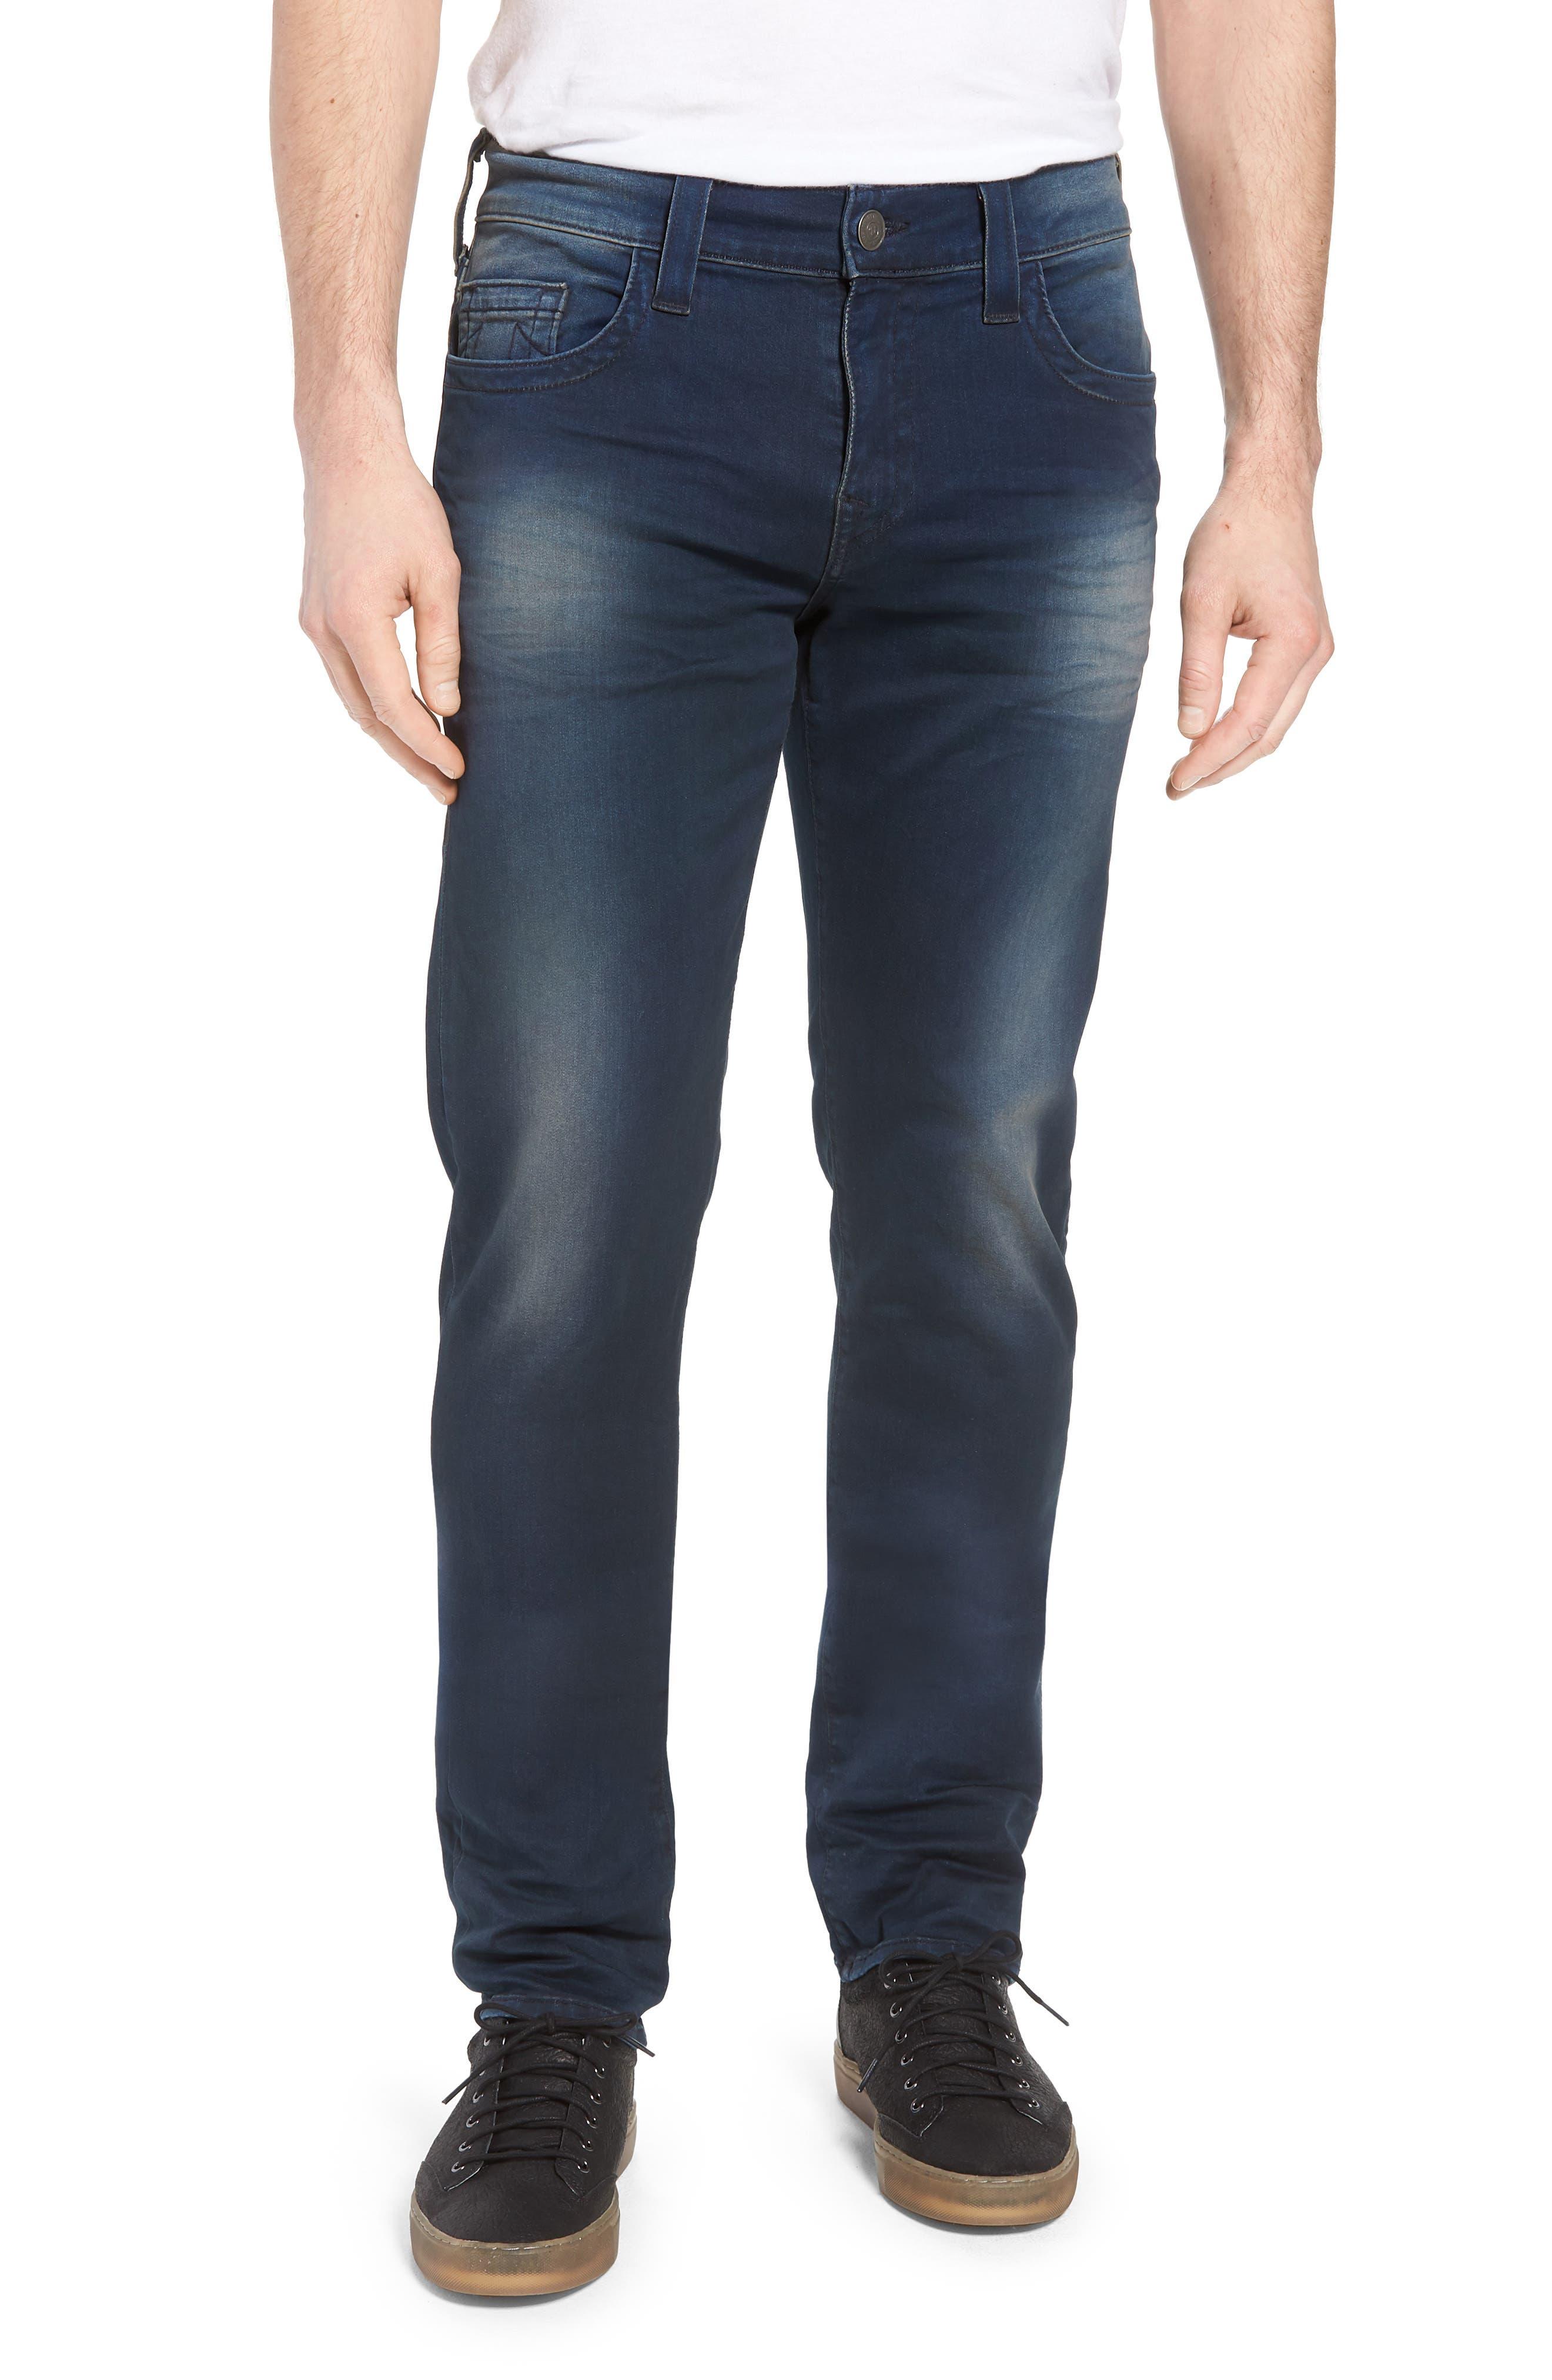 Geno Straight Leg Jeans,                         Main,                         color, Dark Navy